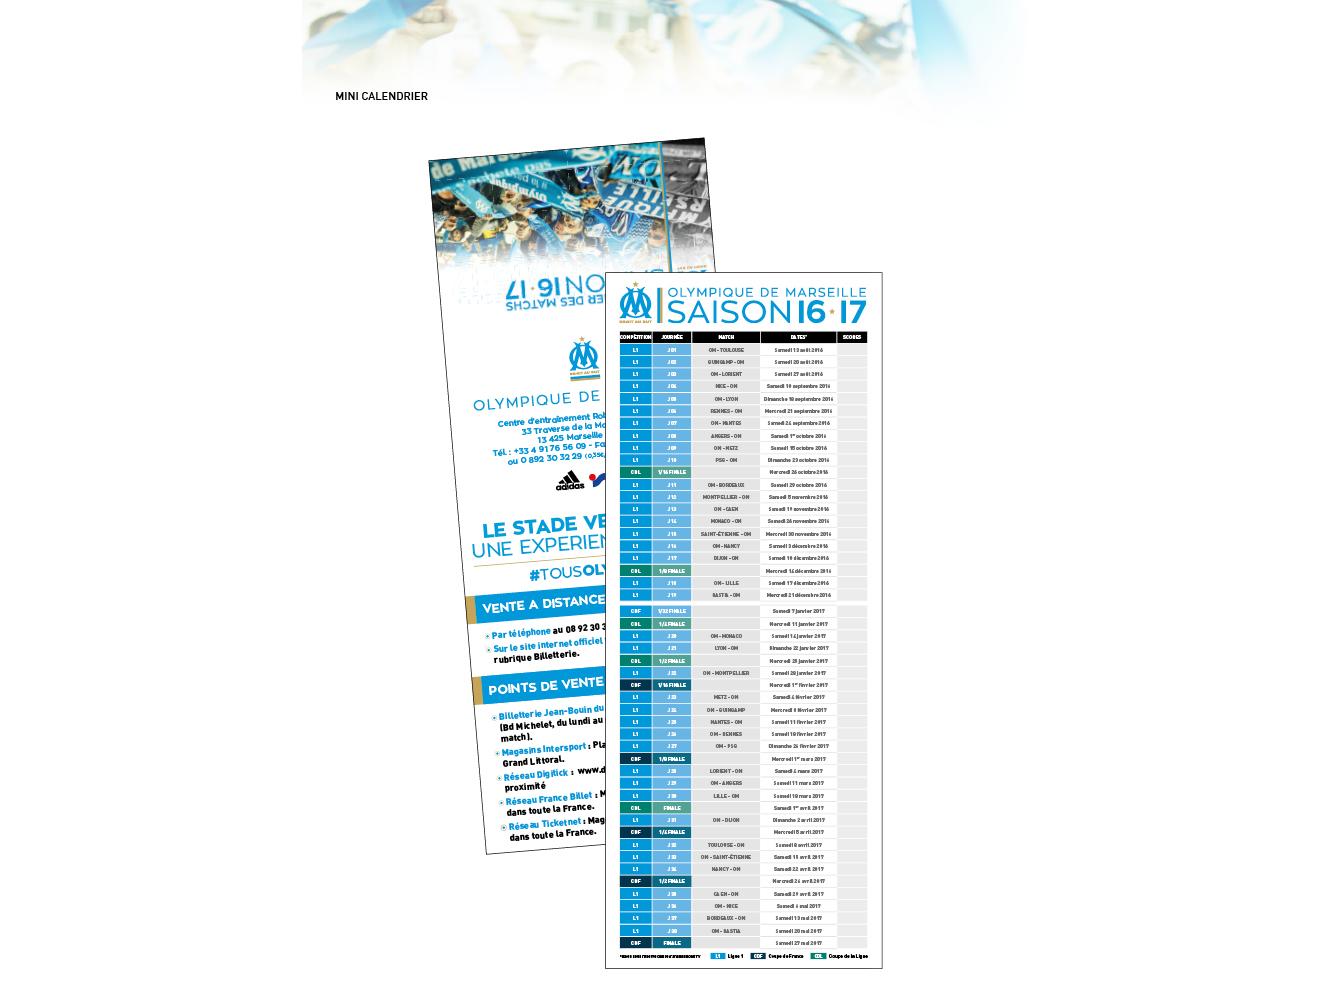 mini calendrier OM saison 16-17